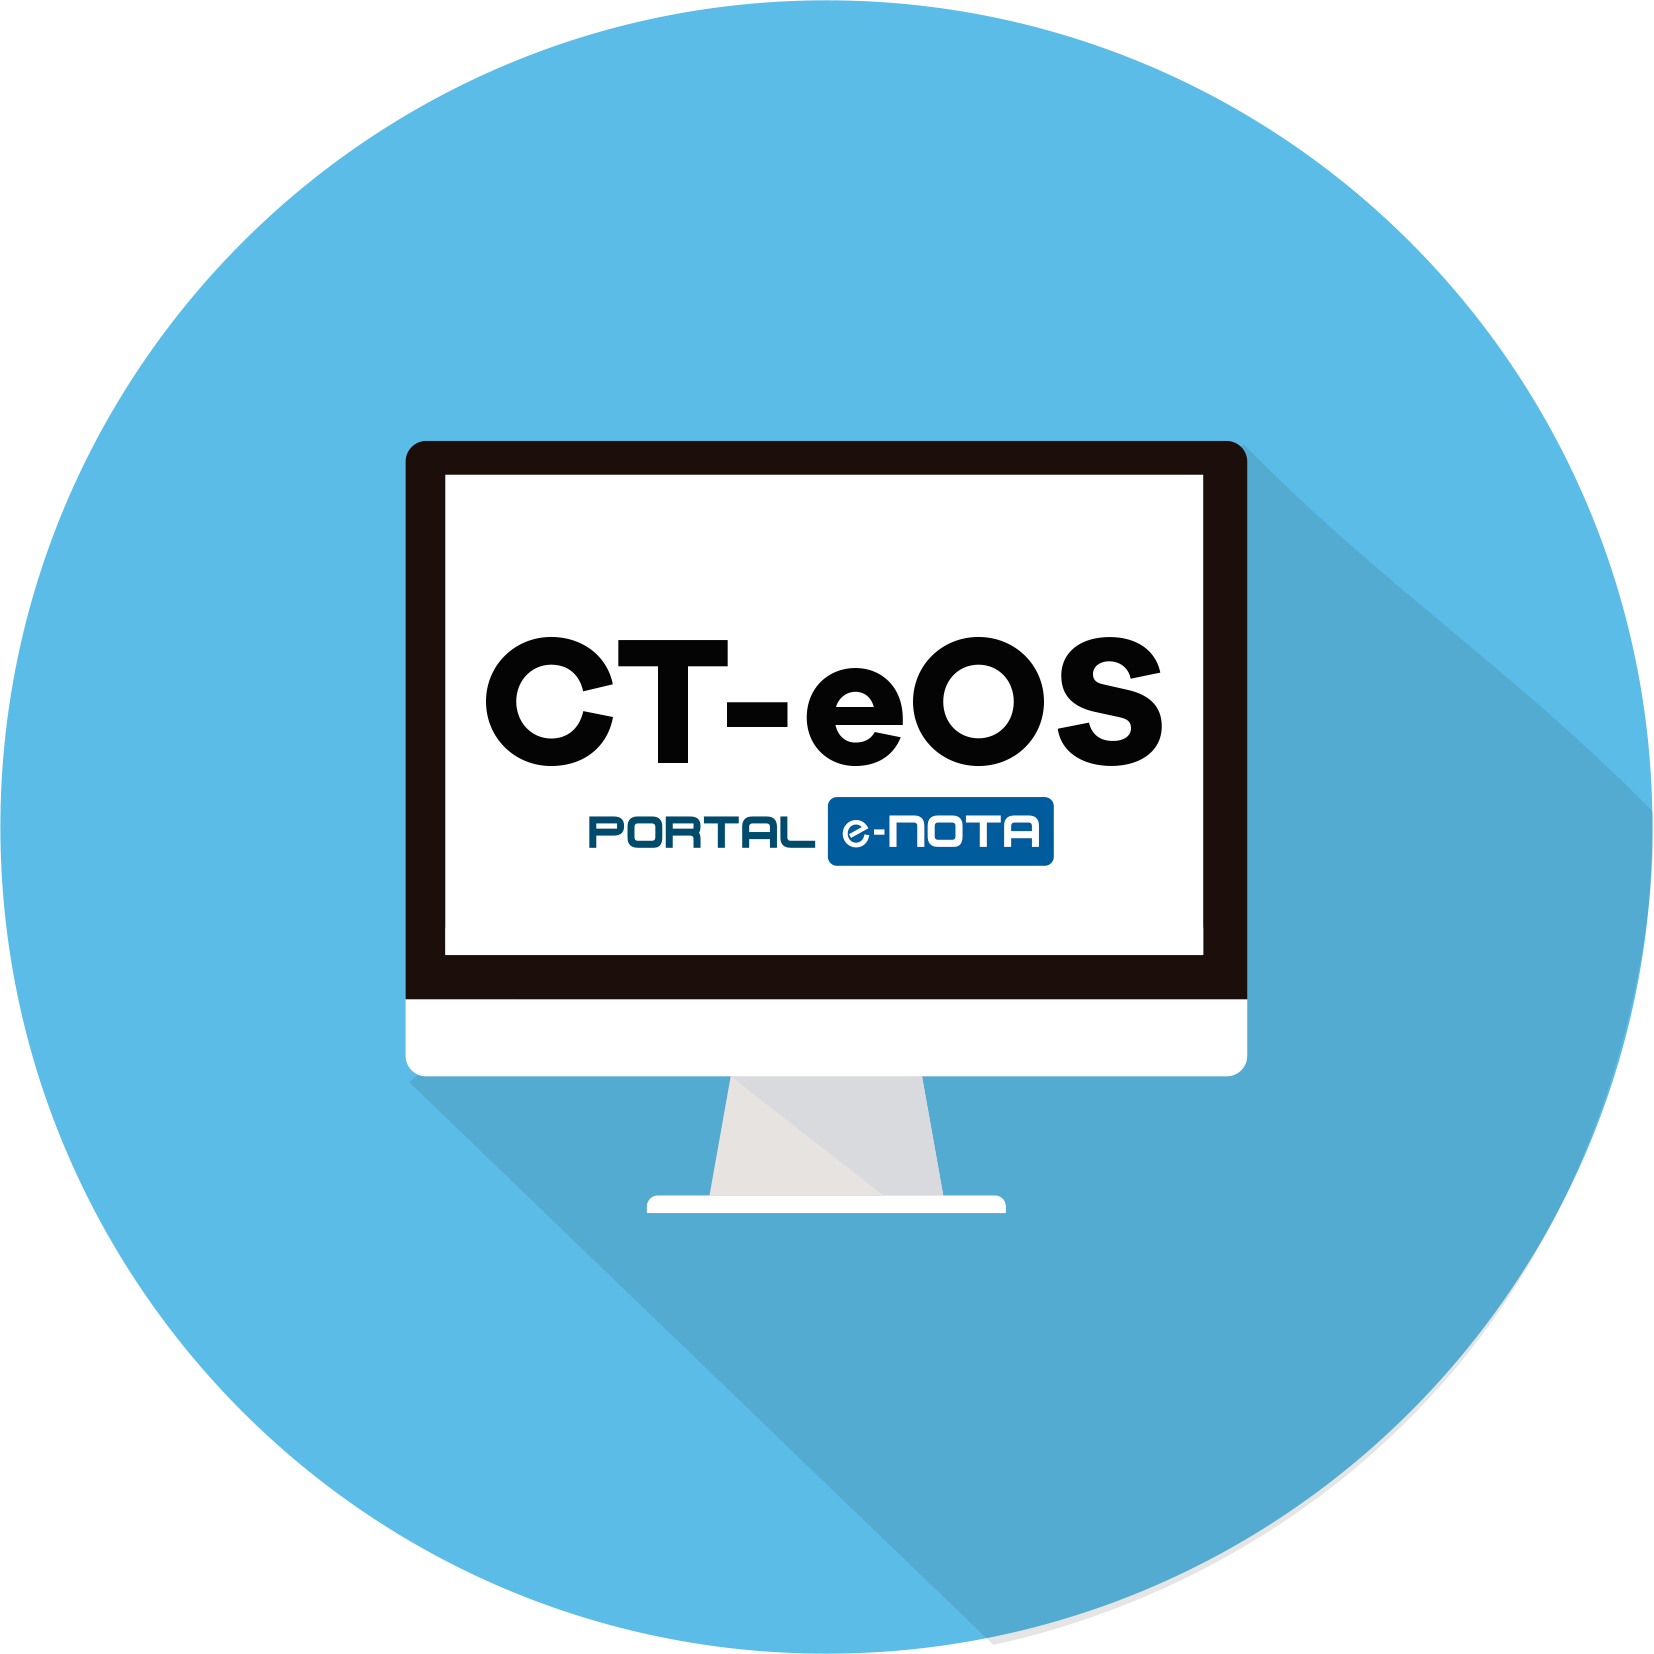 CT-eOS